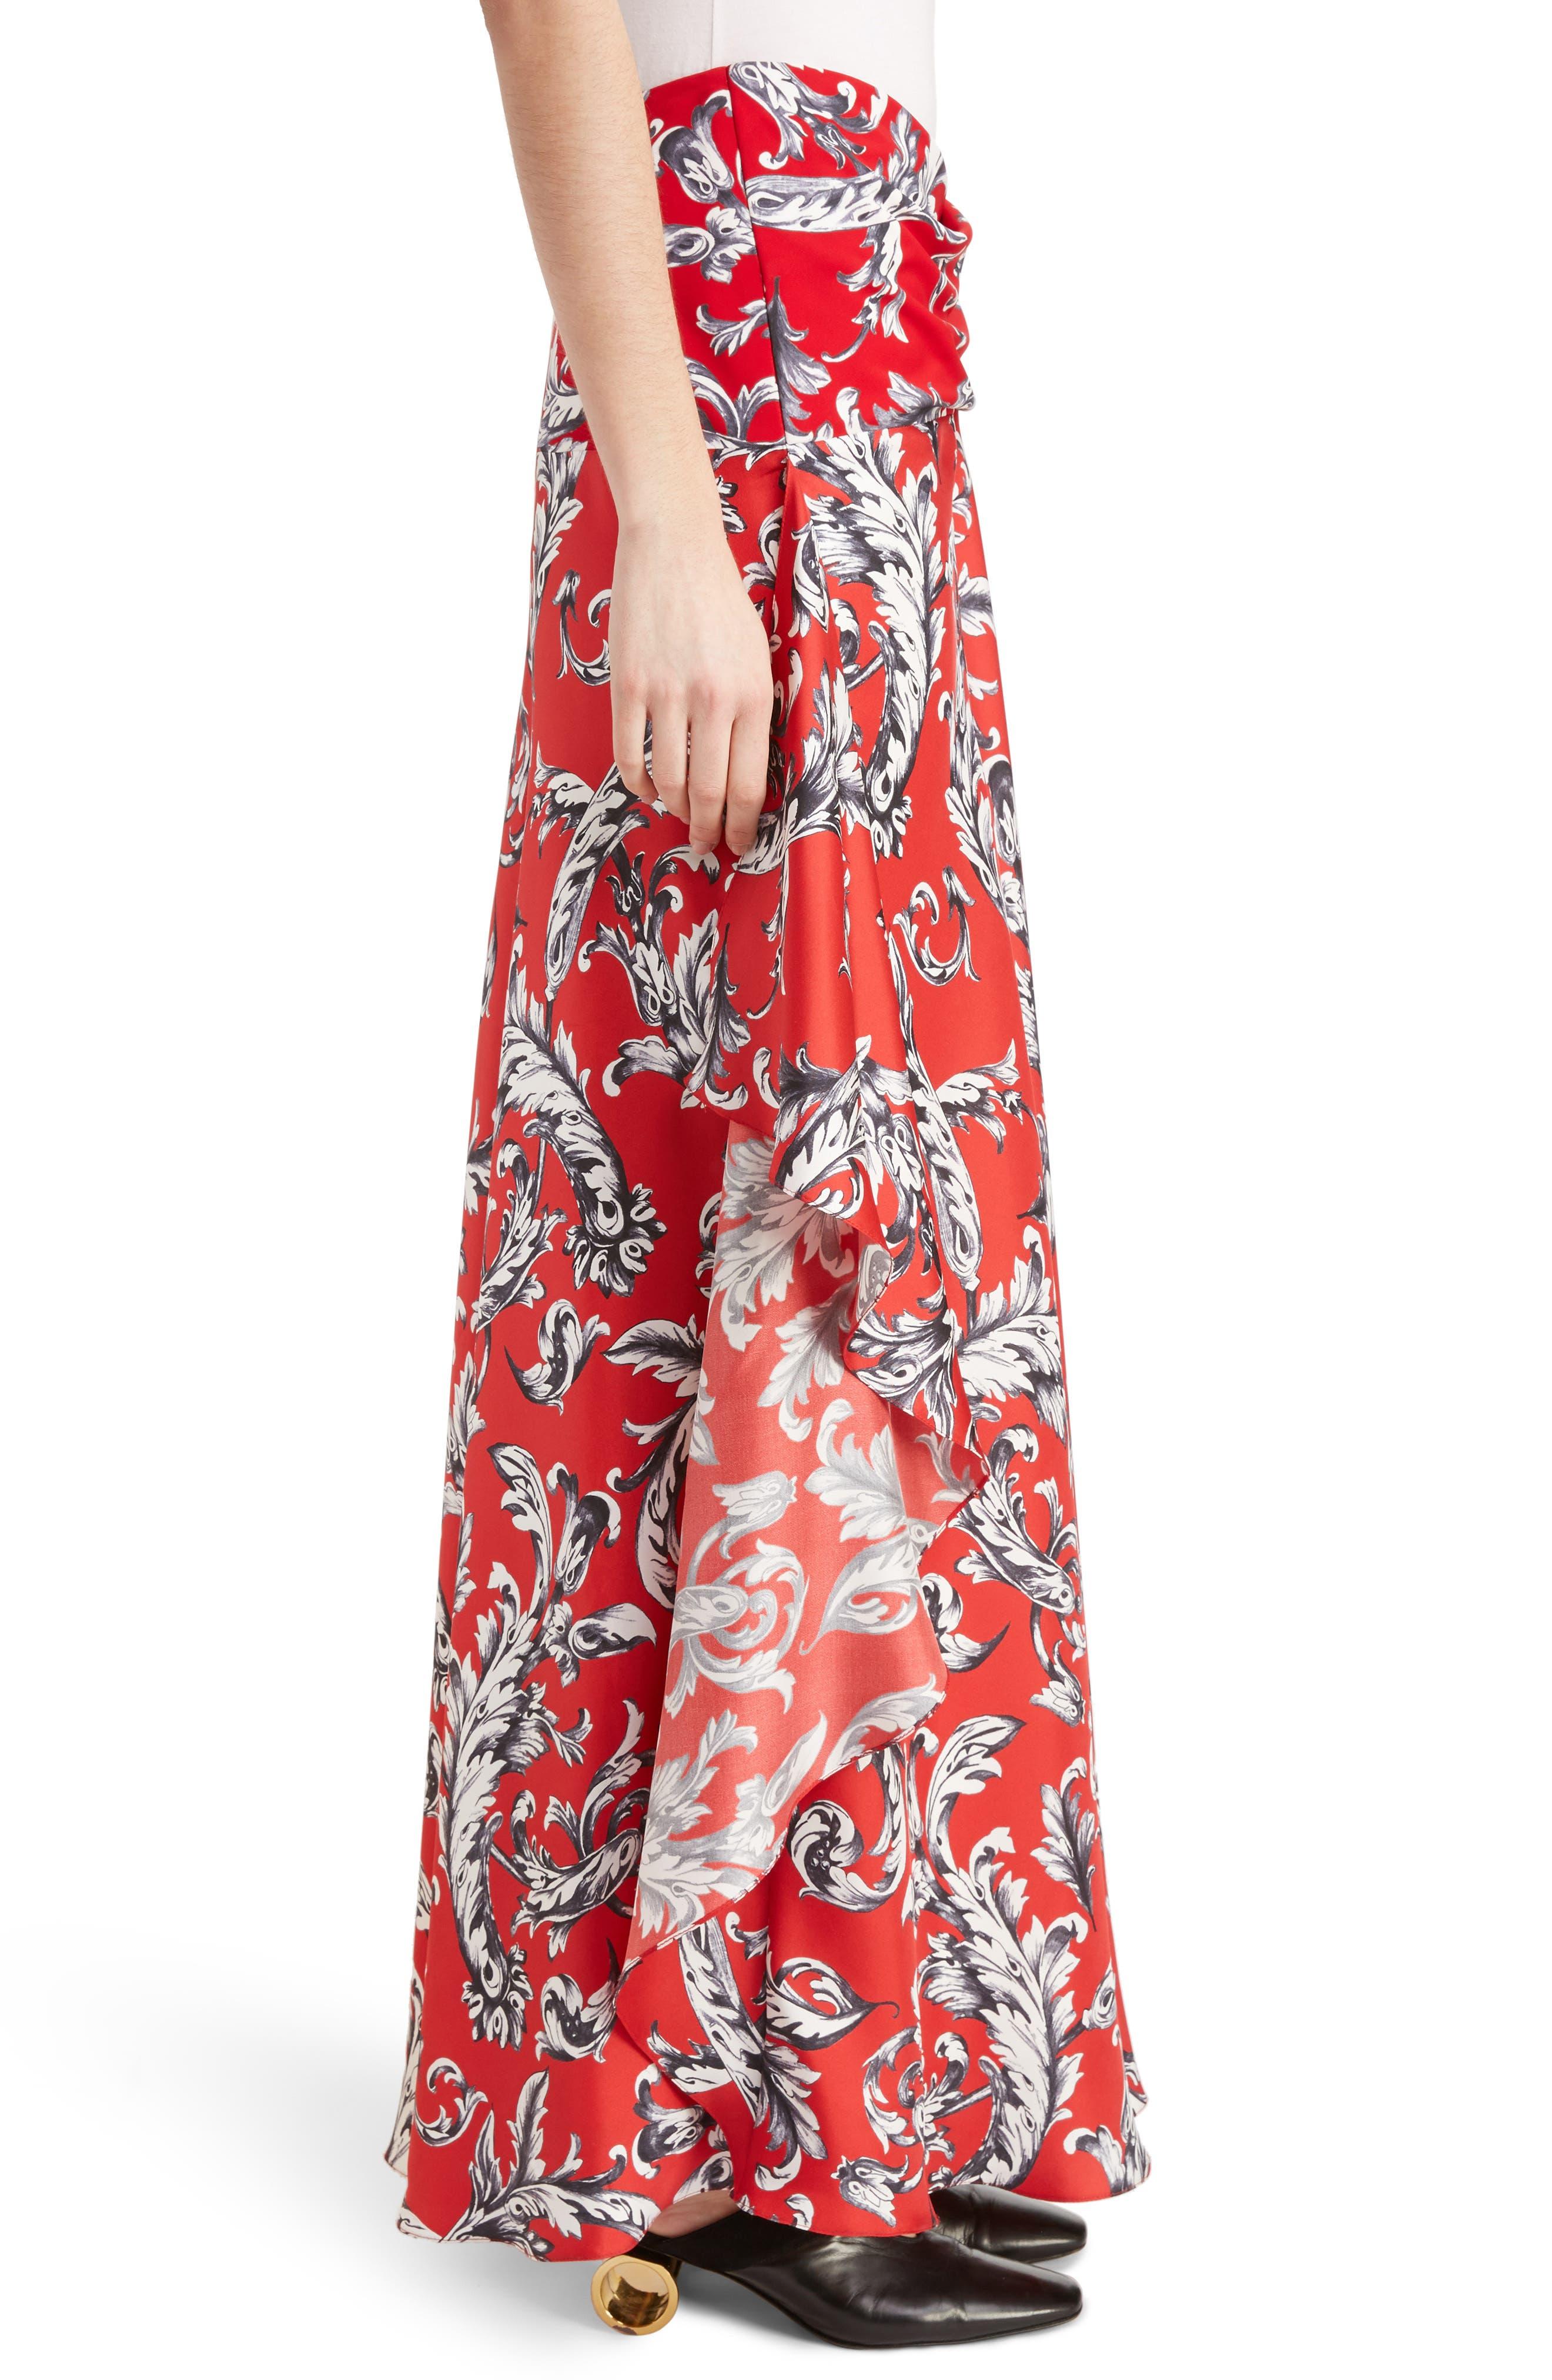 J.W.ANDERSON Filigree Print Asymmetrical Maxi Skirt,                             Alternate thumbnail 3, color,